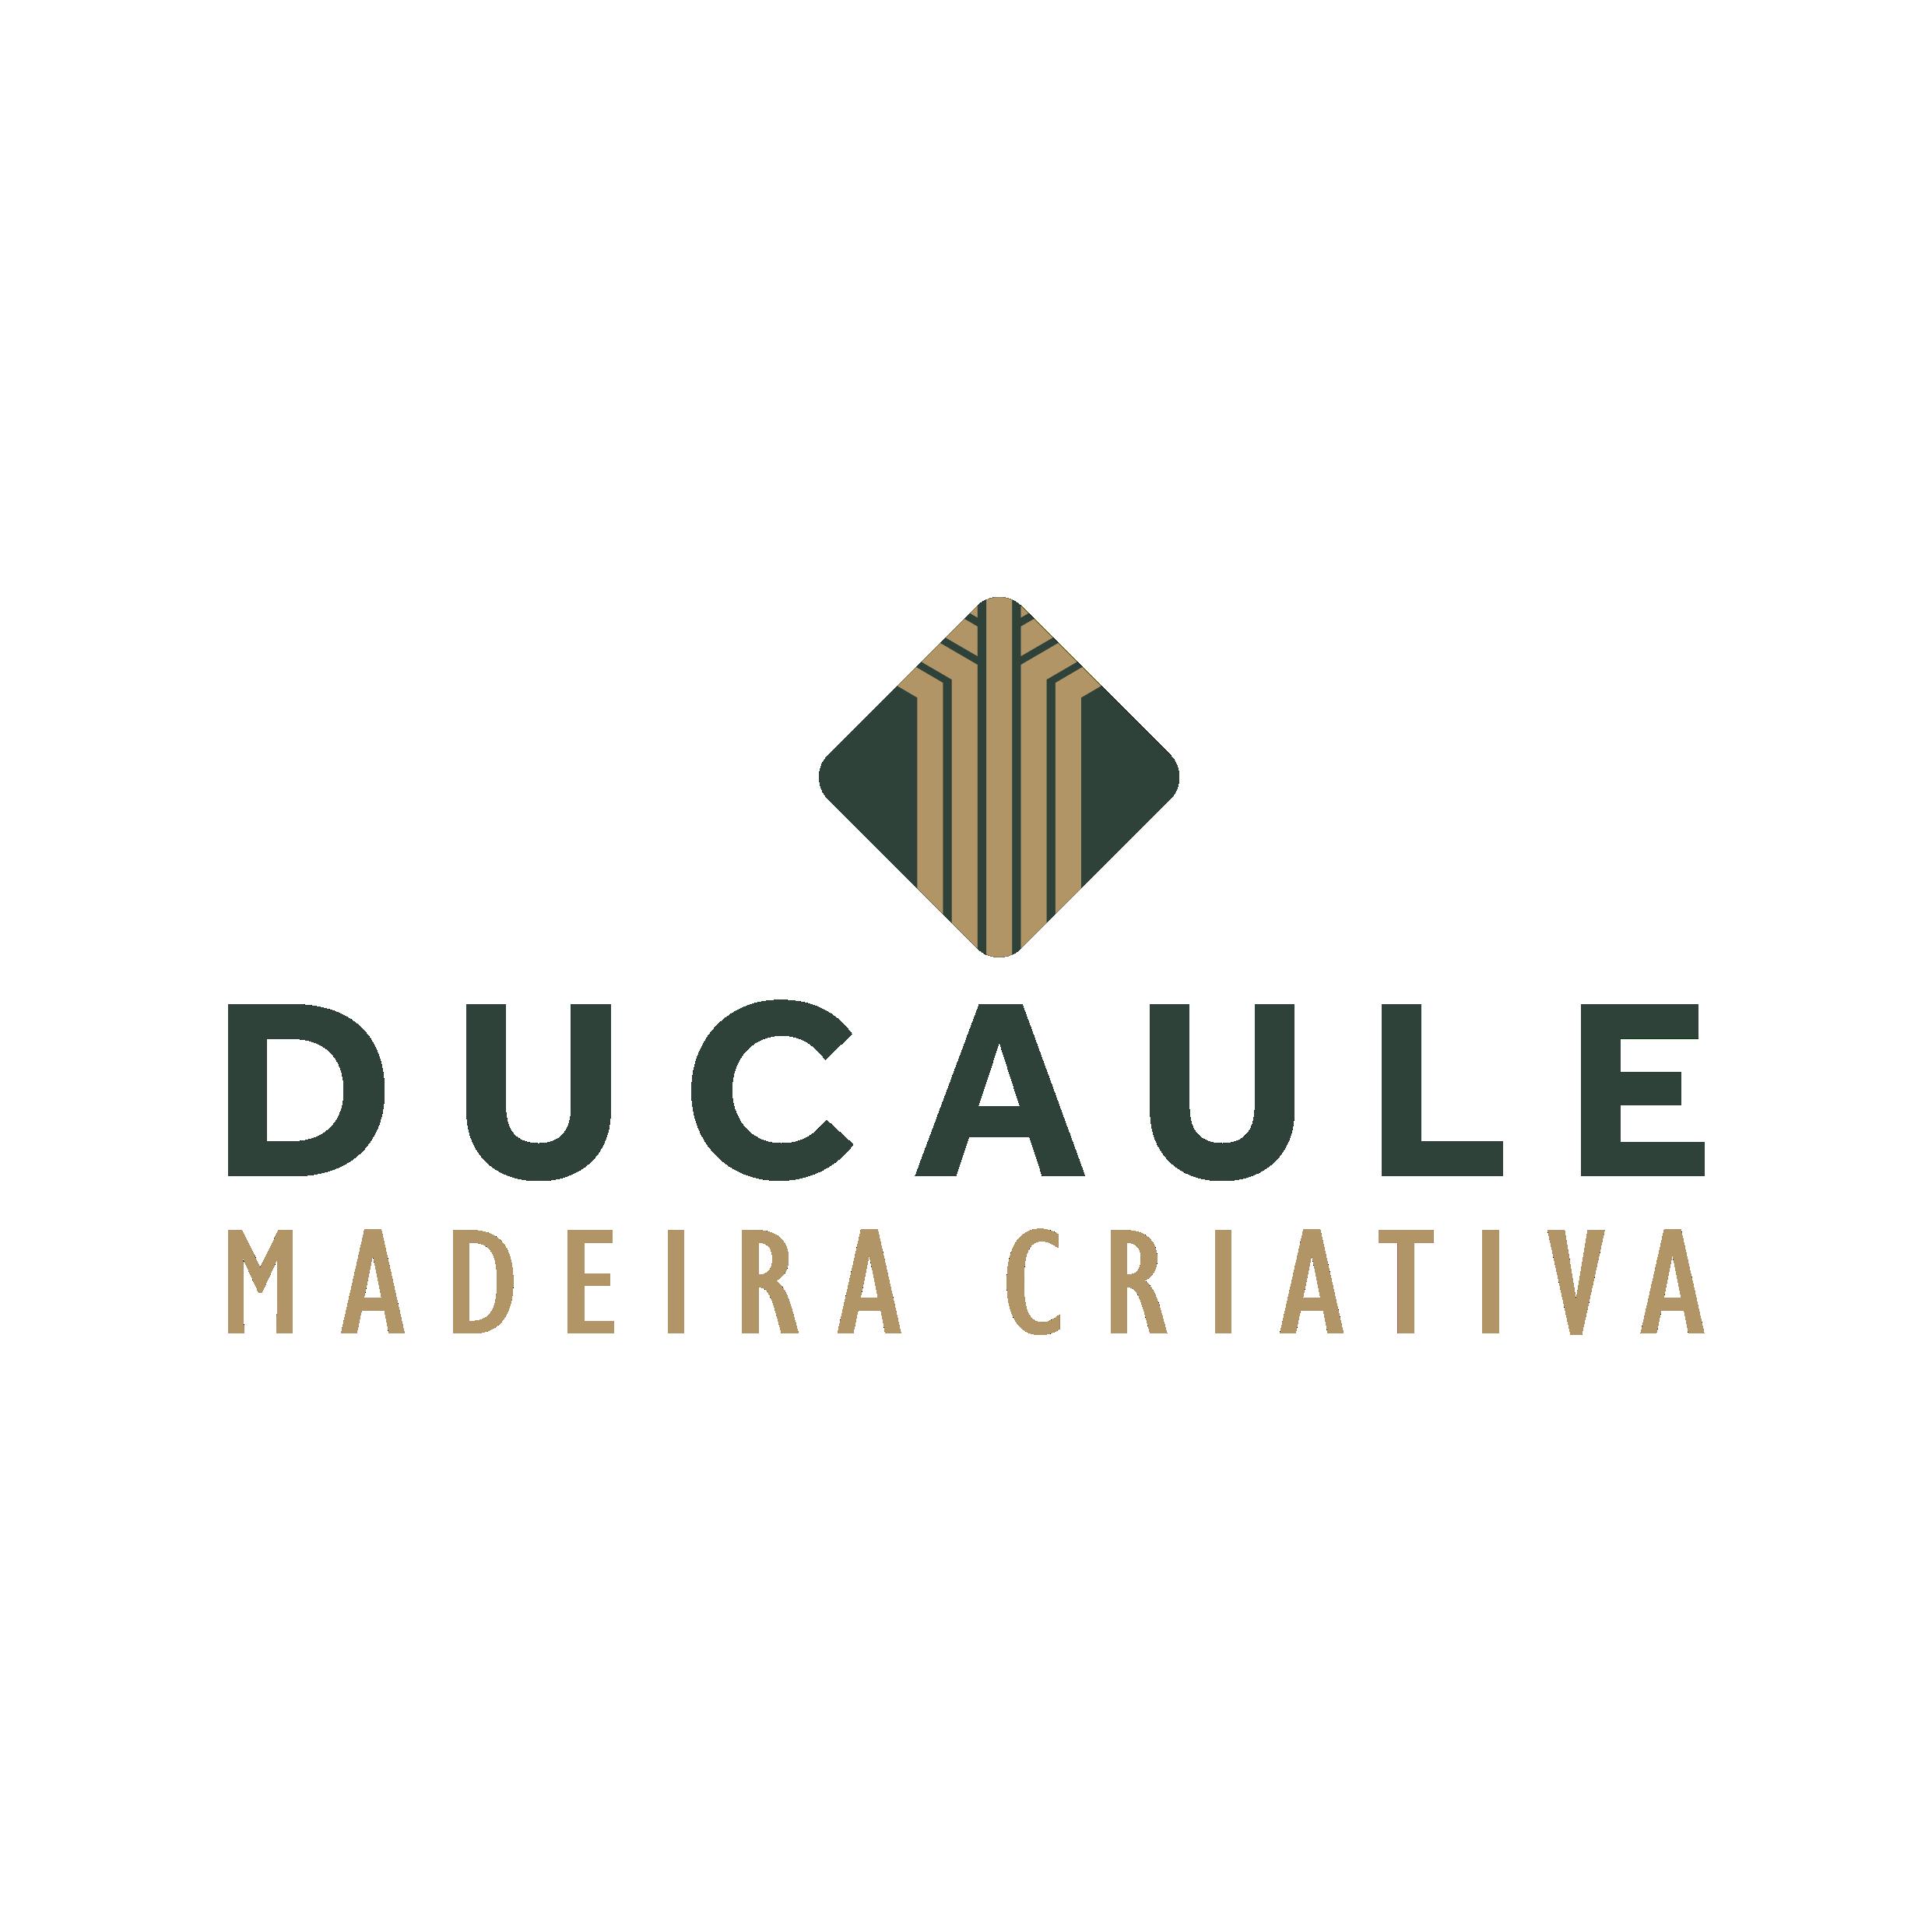 Ducaule logo